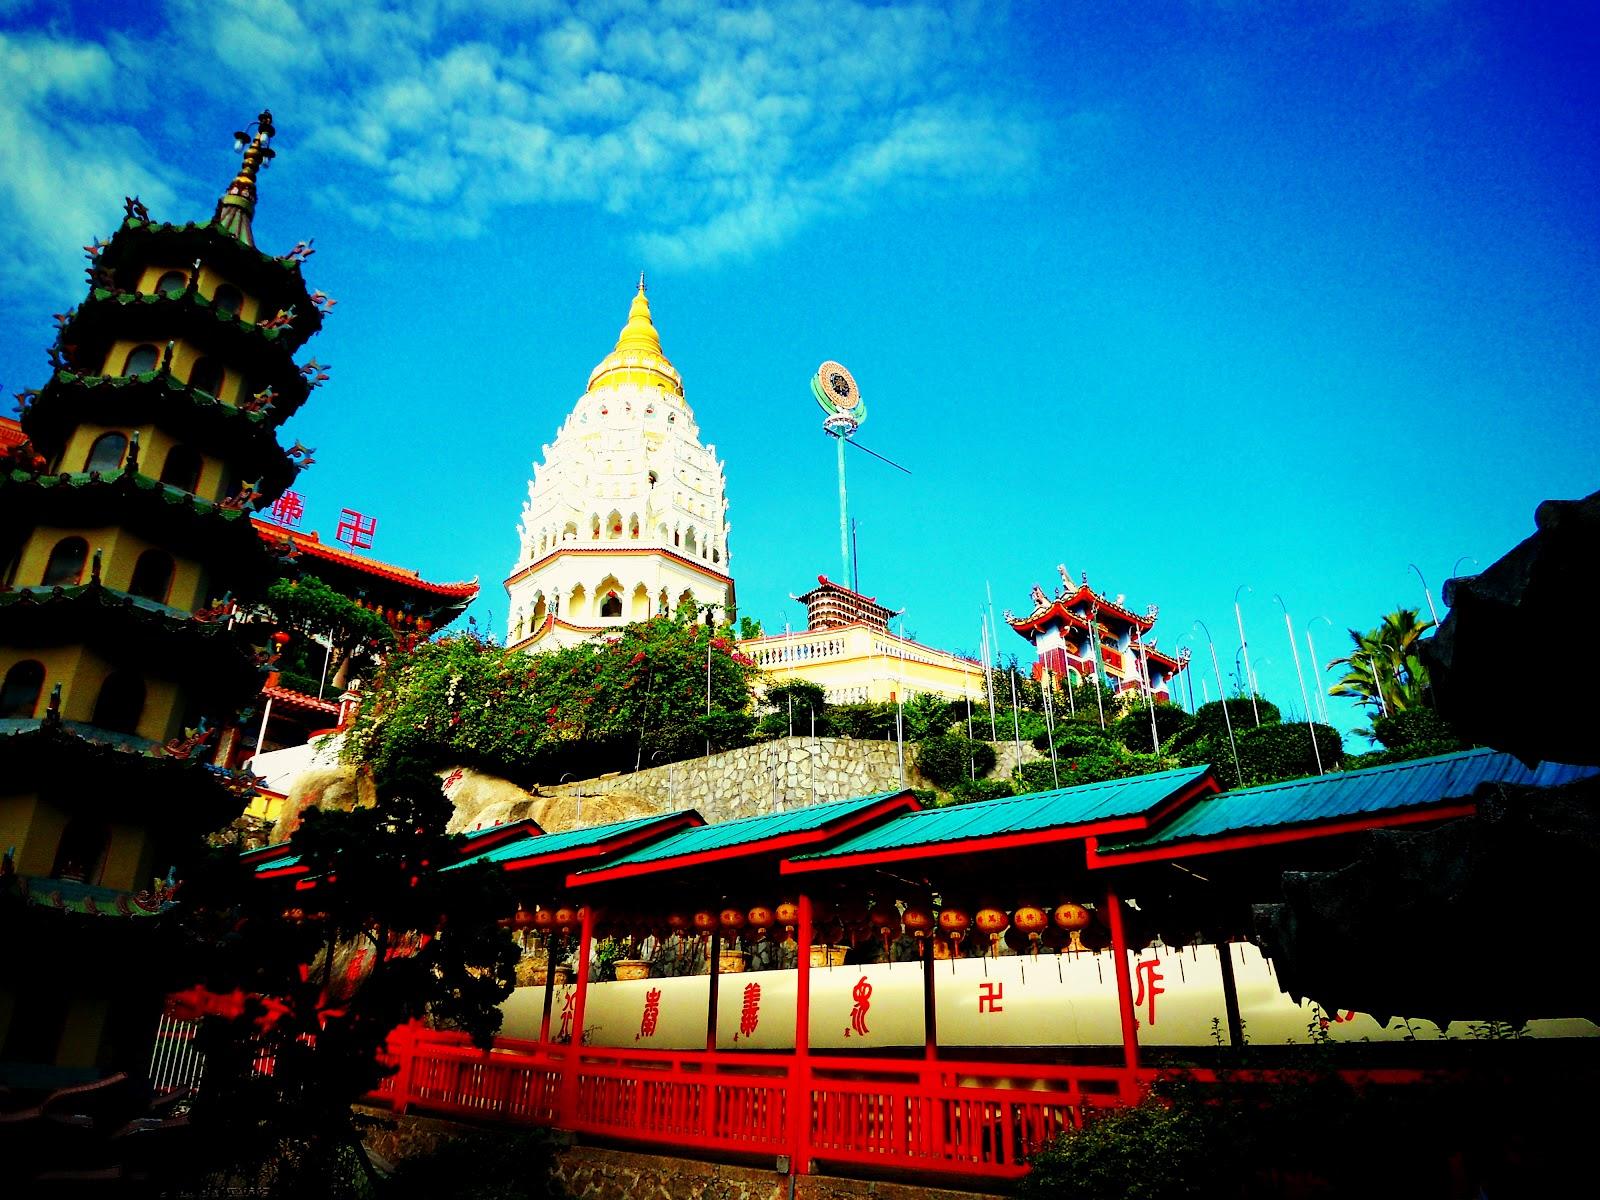 Amazing Malaysia Kek Lok Si Temple Penang The Temple Of Supreme Bliss